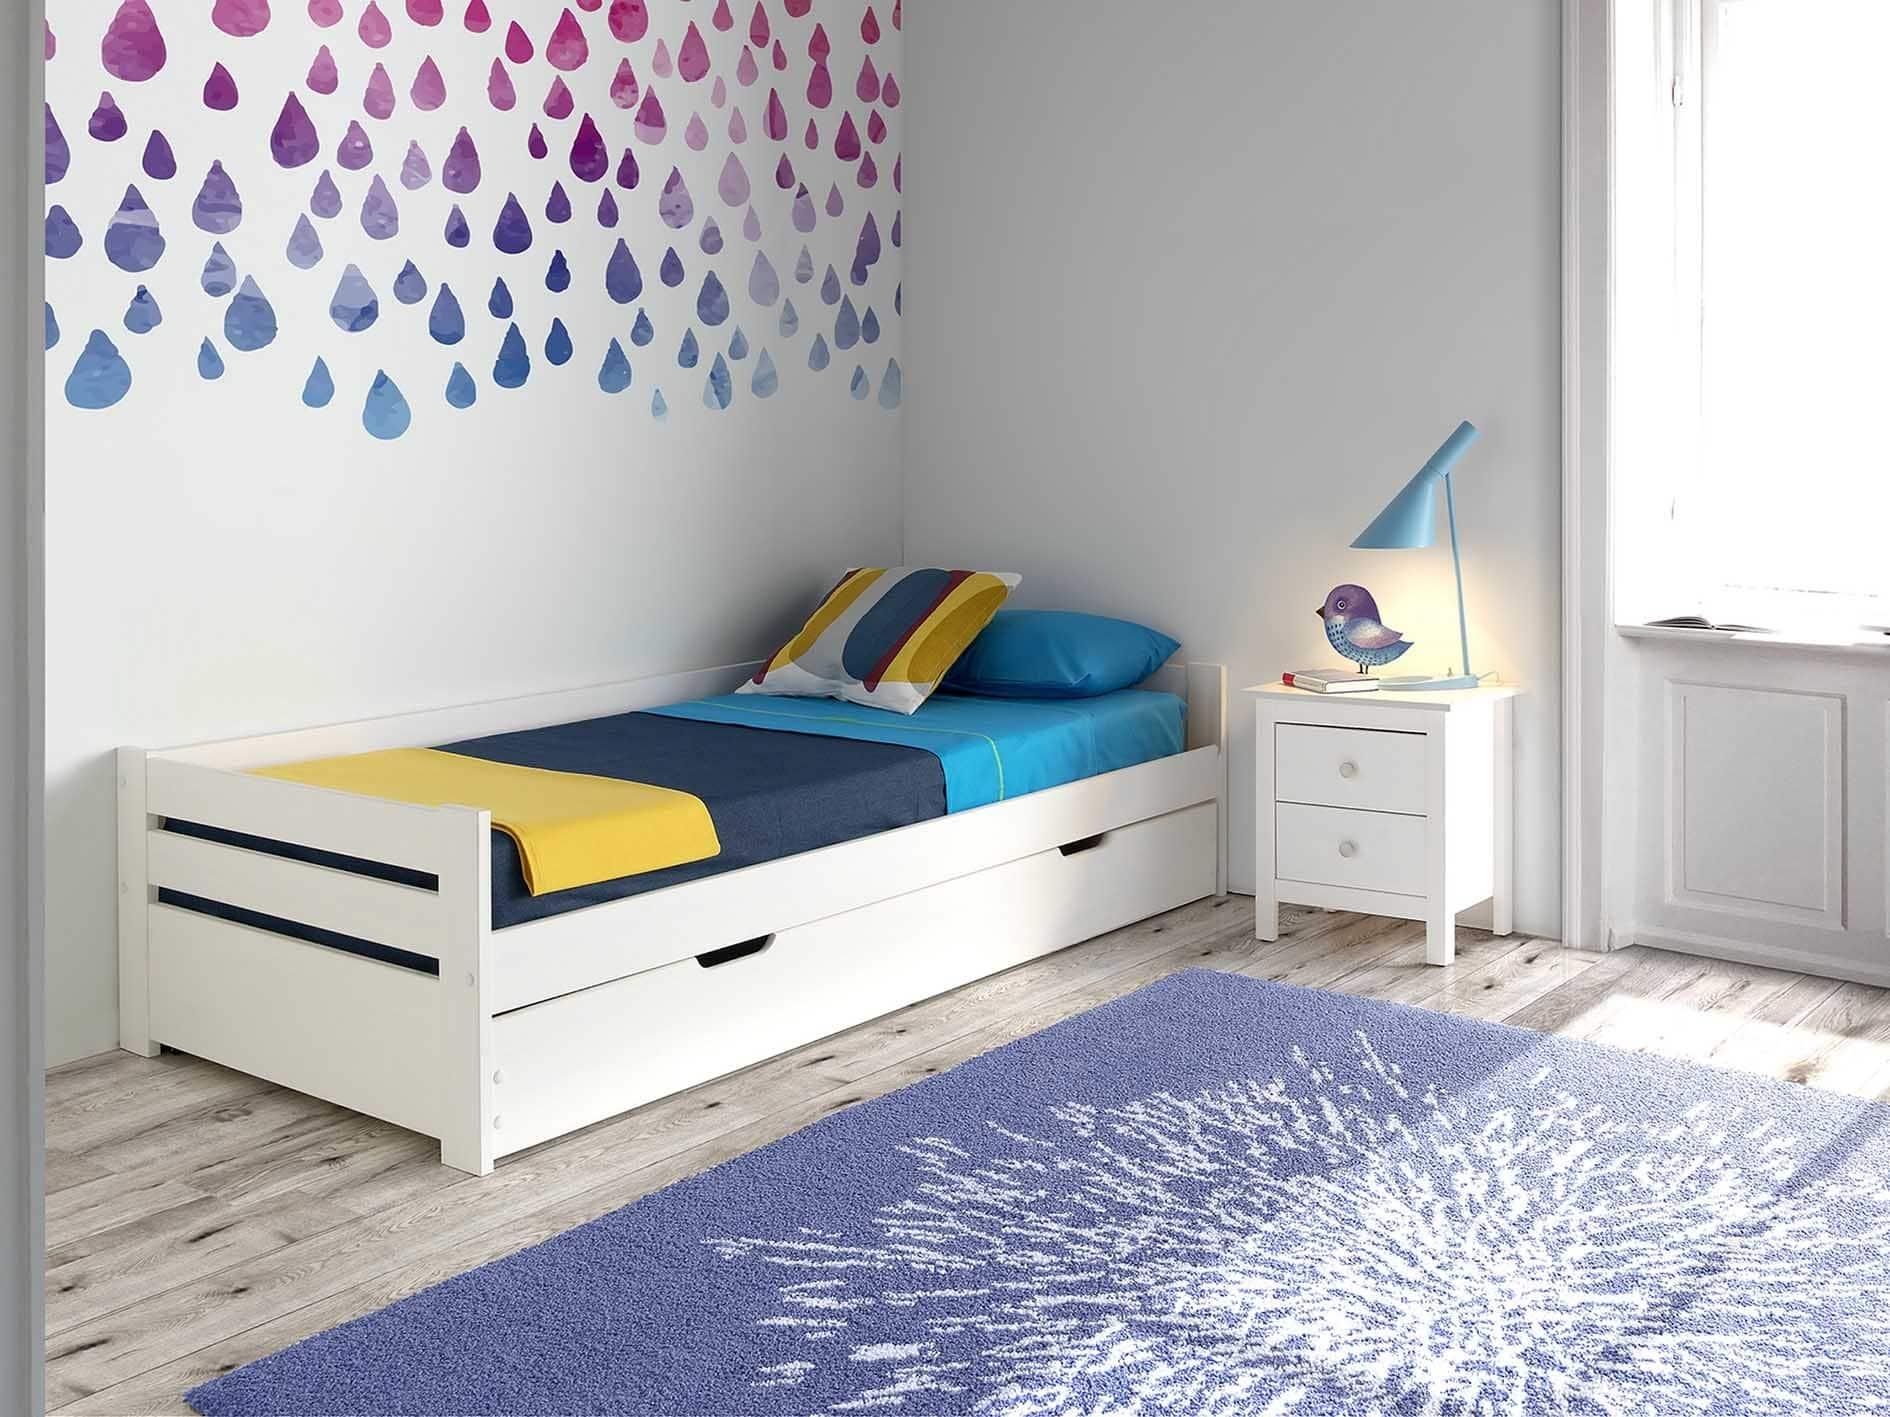 Ideas de cama nido blanca para habitaciones infantiles for Camas nido infantiles